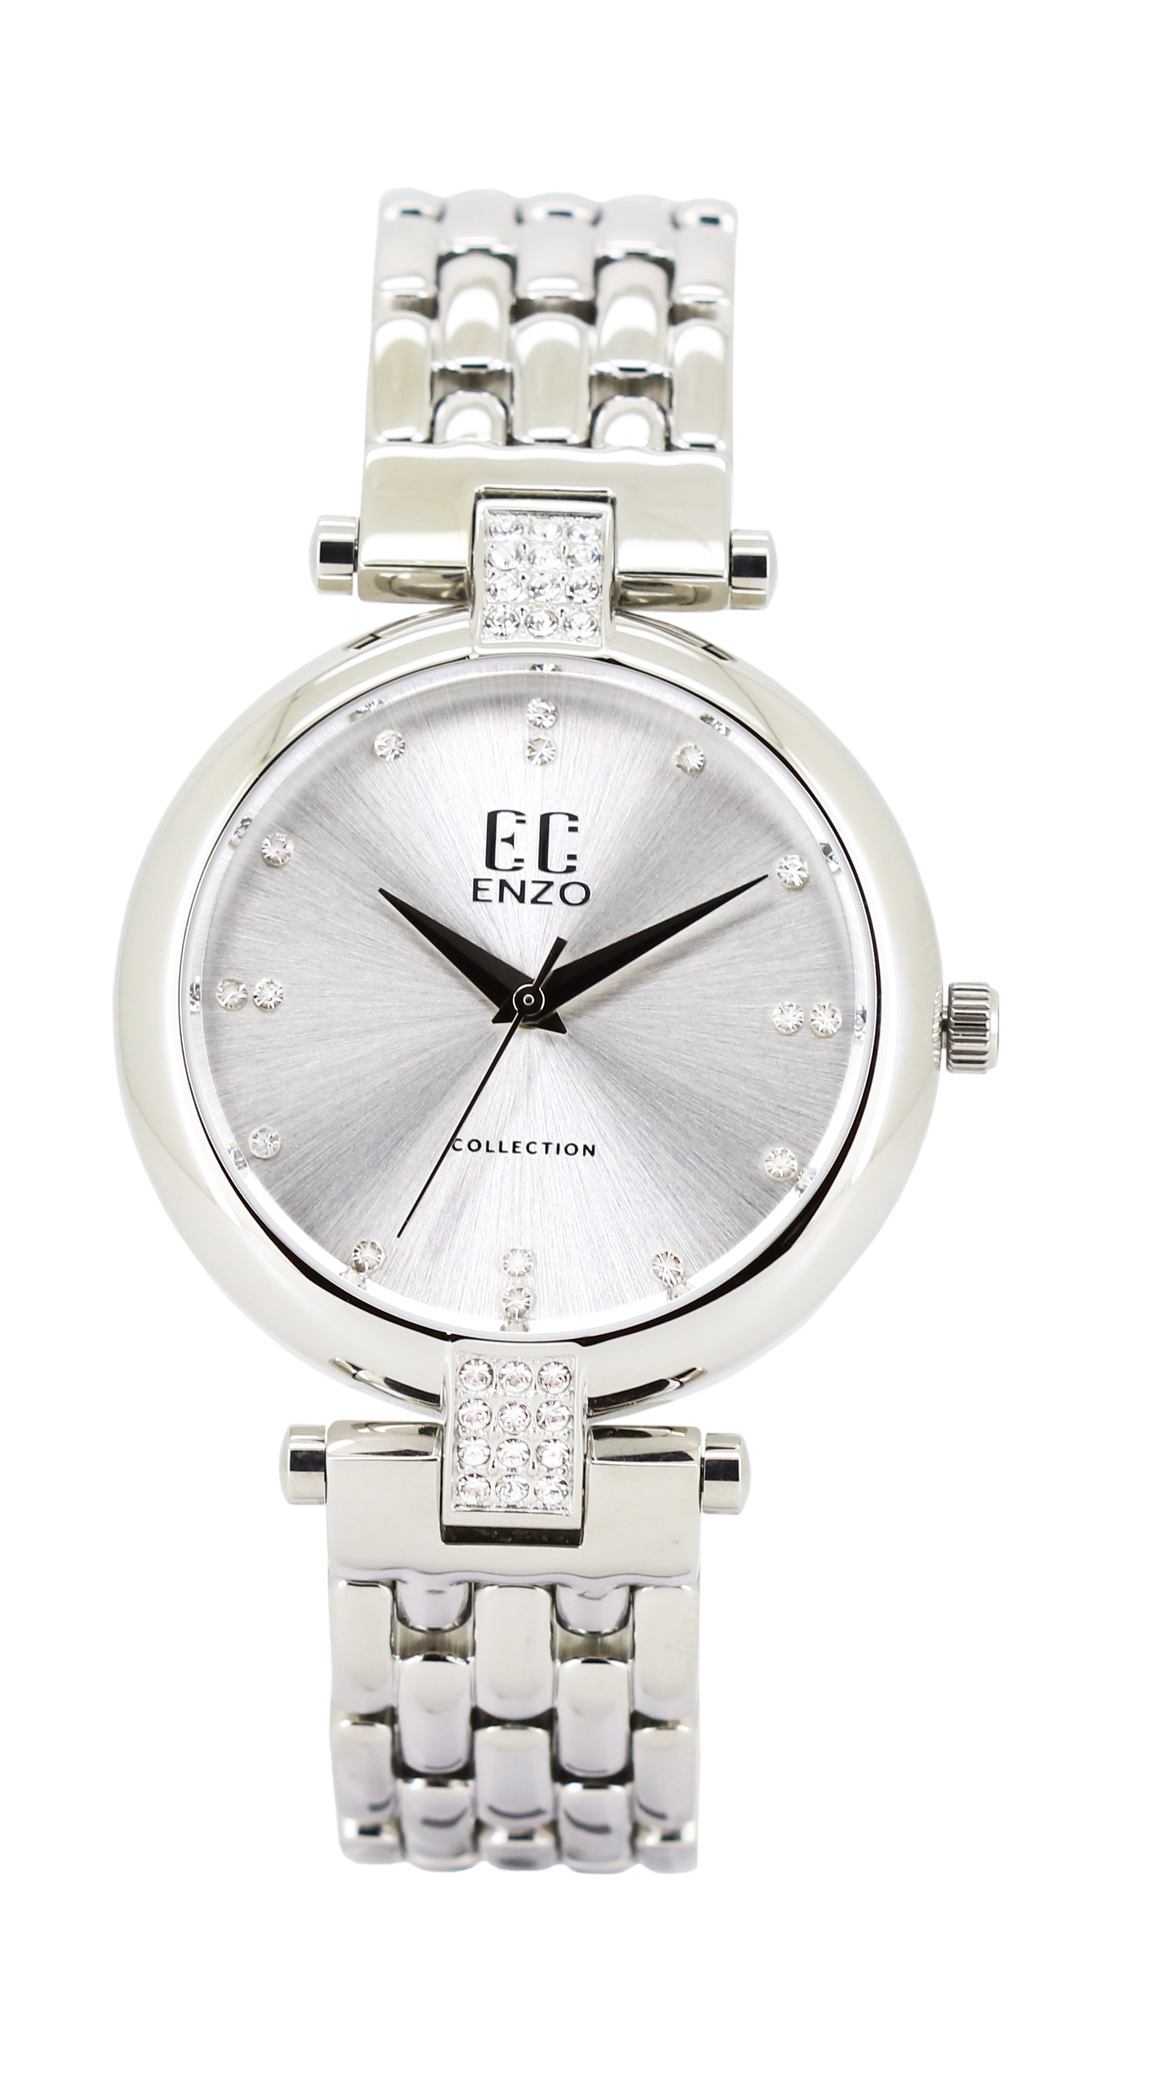 EC#3087# – Enzo Collection